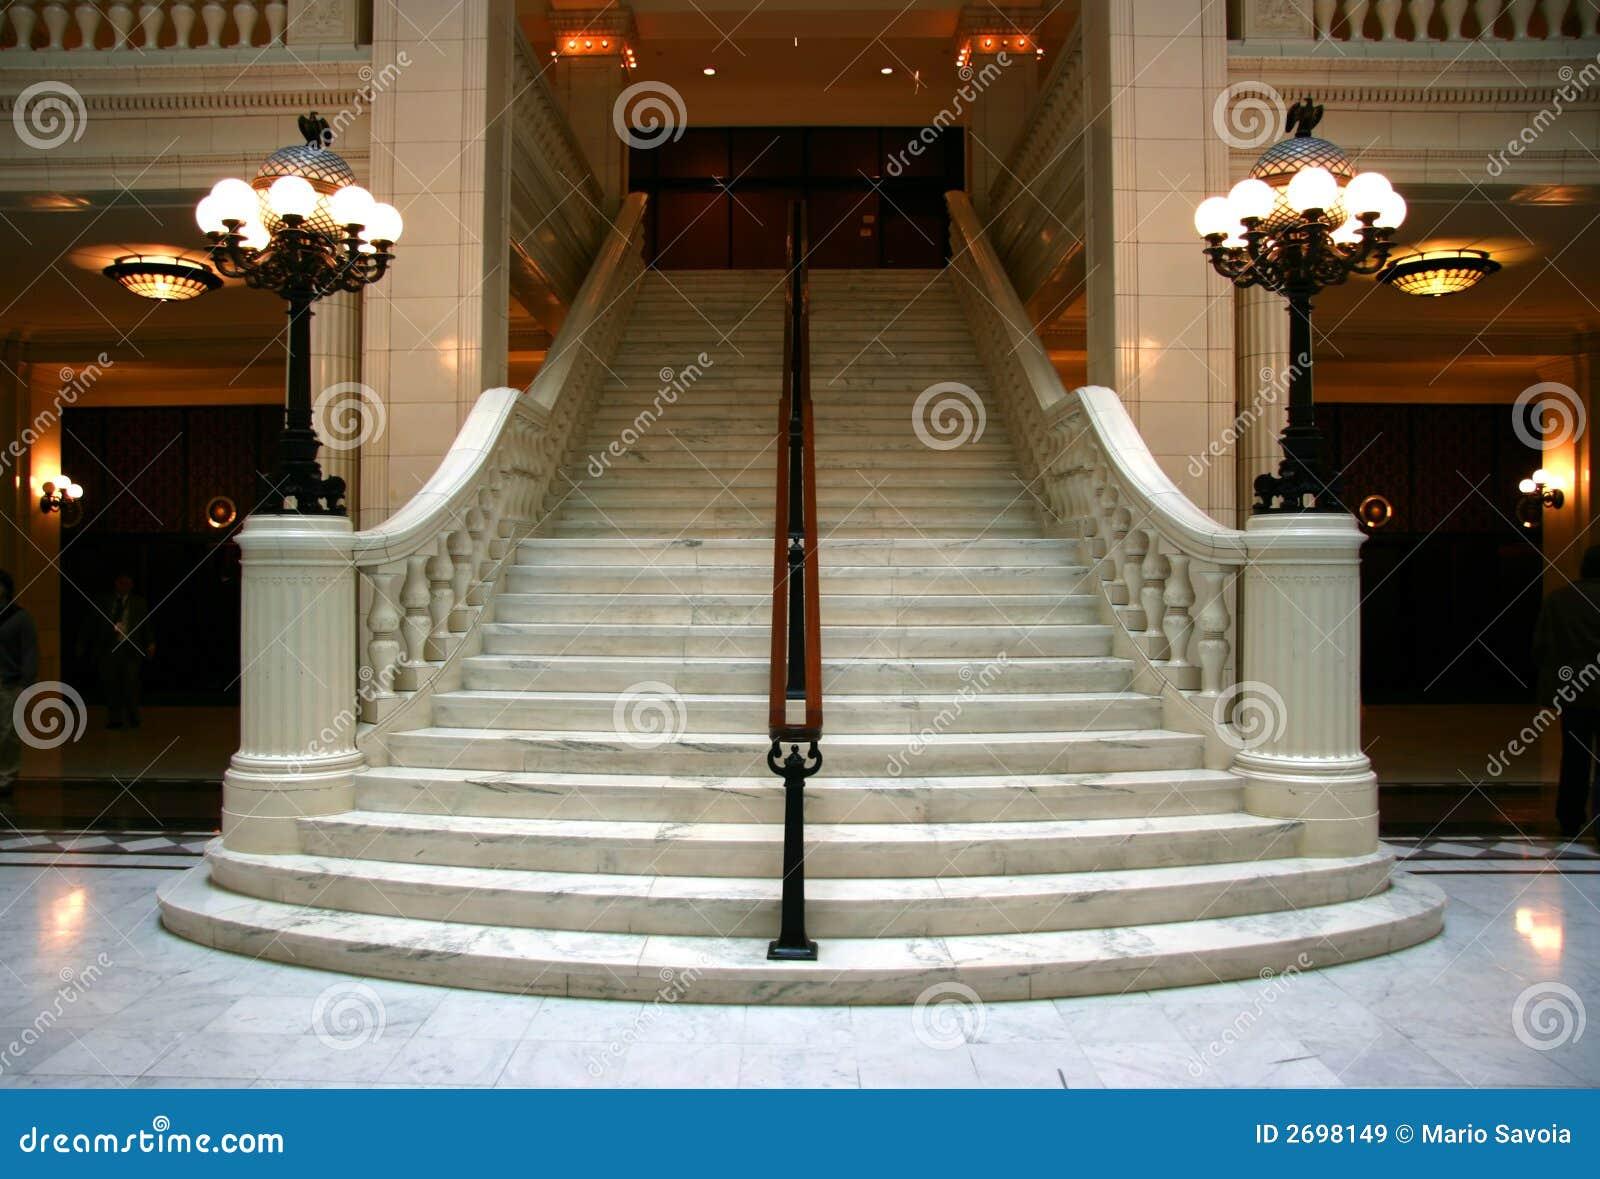 escalier de marbre images libres de droits image 2698149. Black Bedroom Furniture Sets. Home Design Ideas